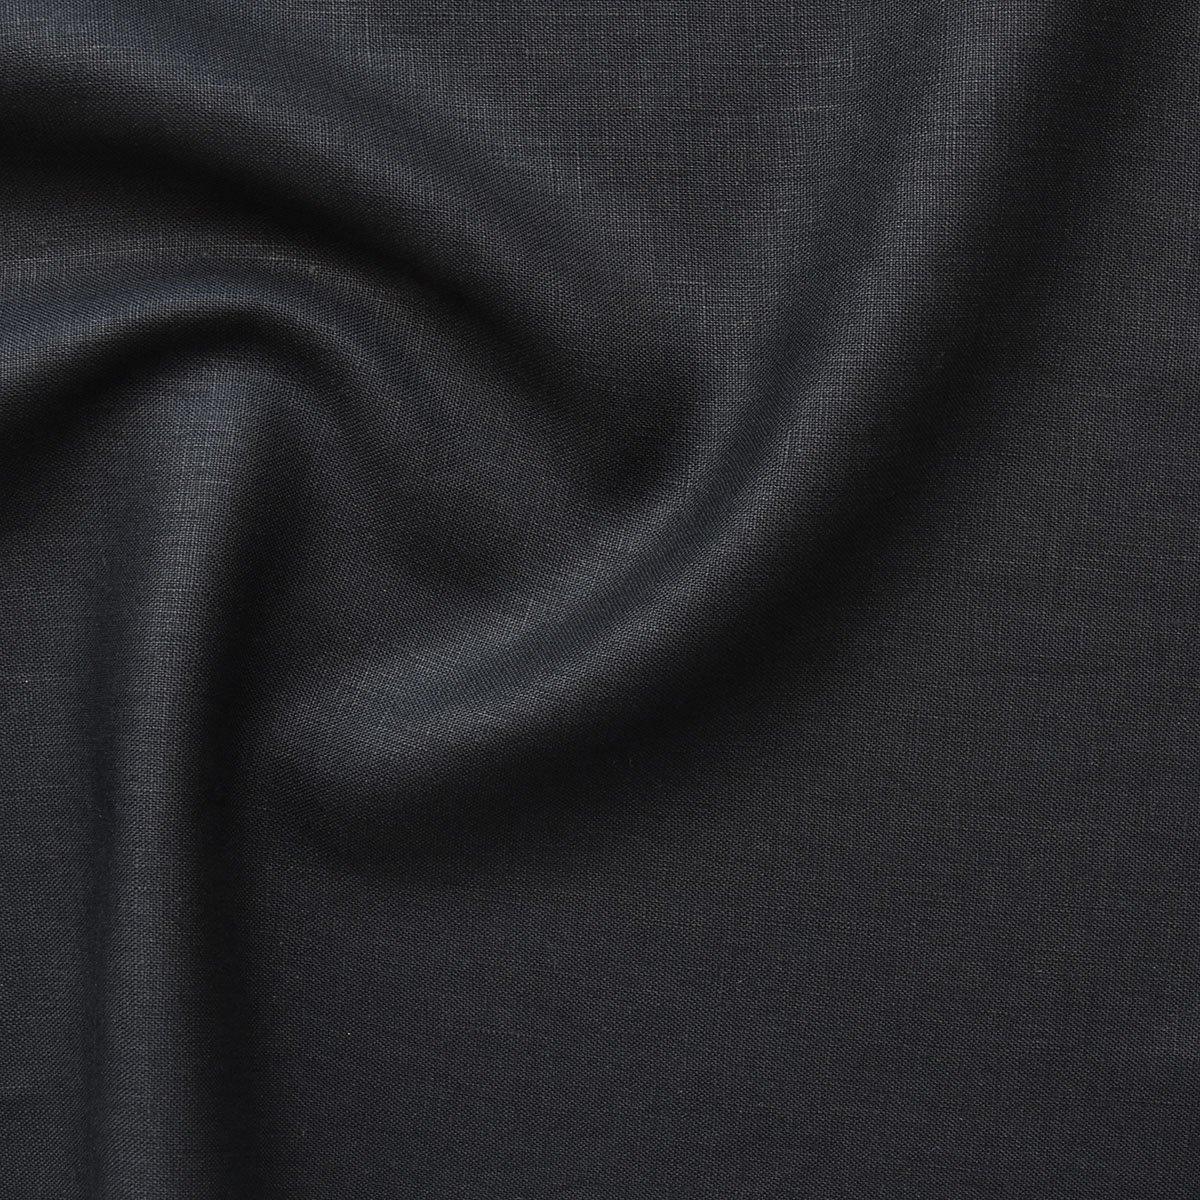 Mid-weight Linen - Black